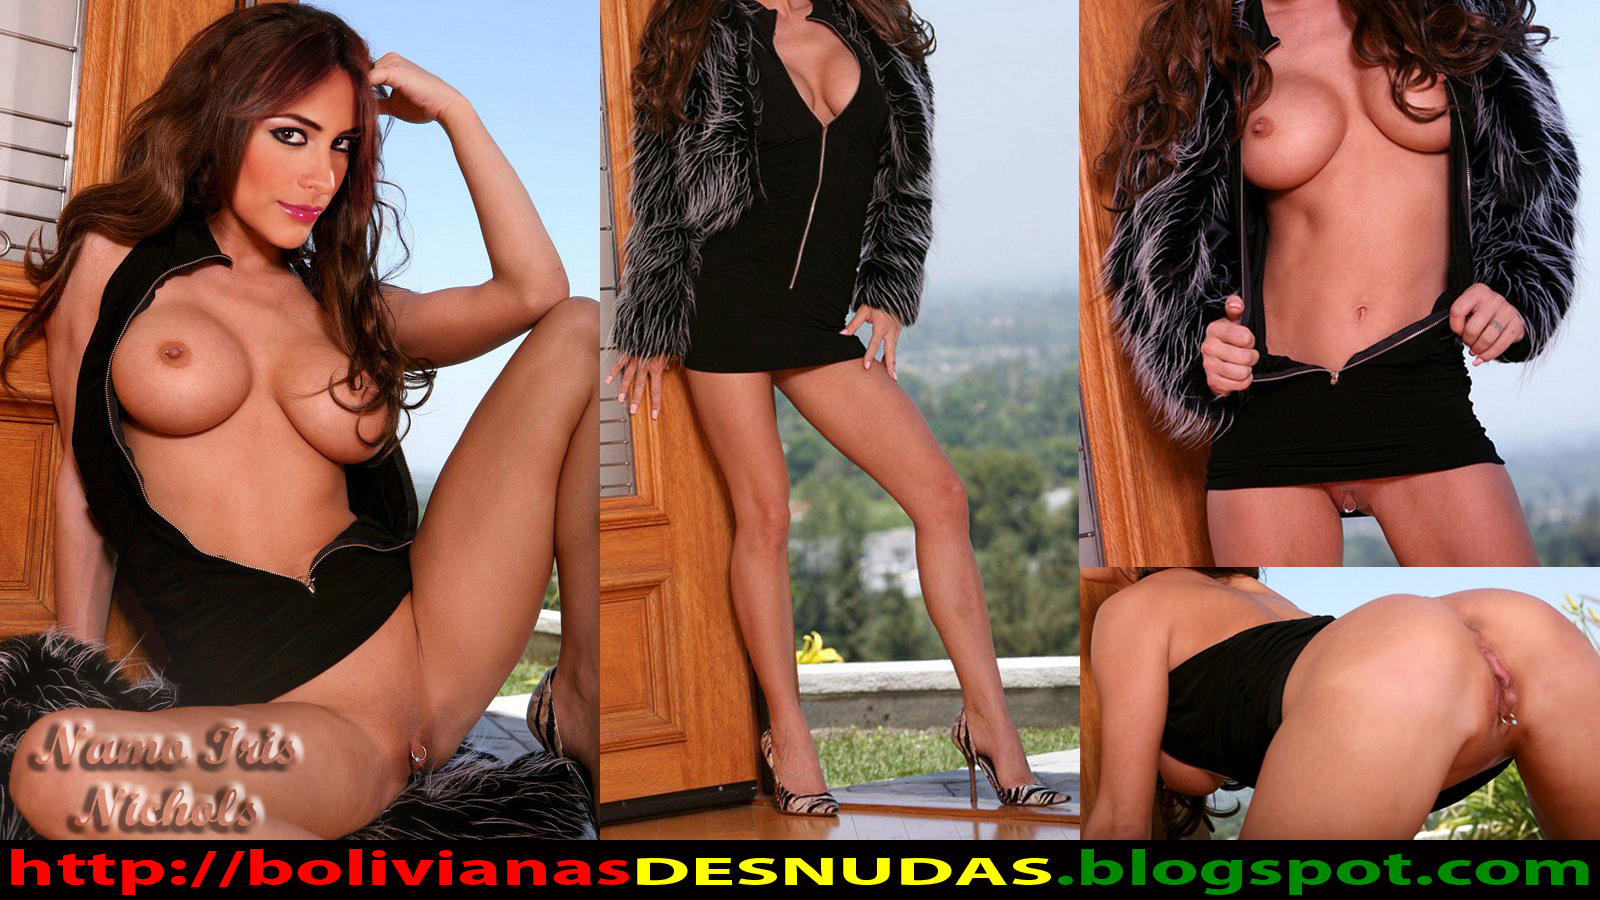 Namo Iris Nichols Super Hot